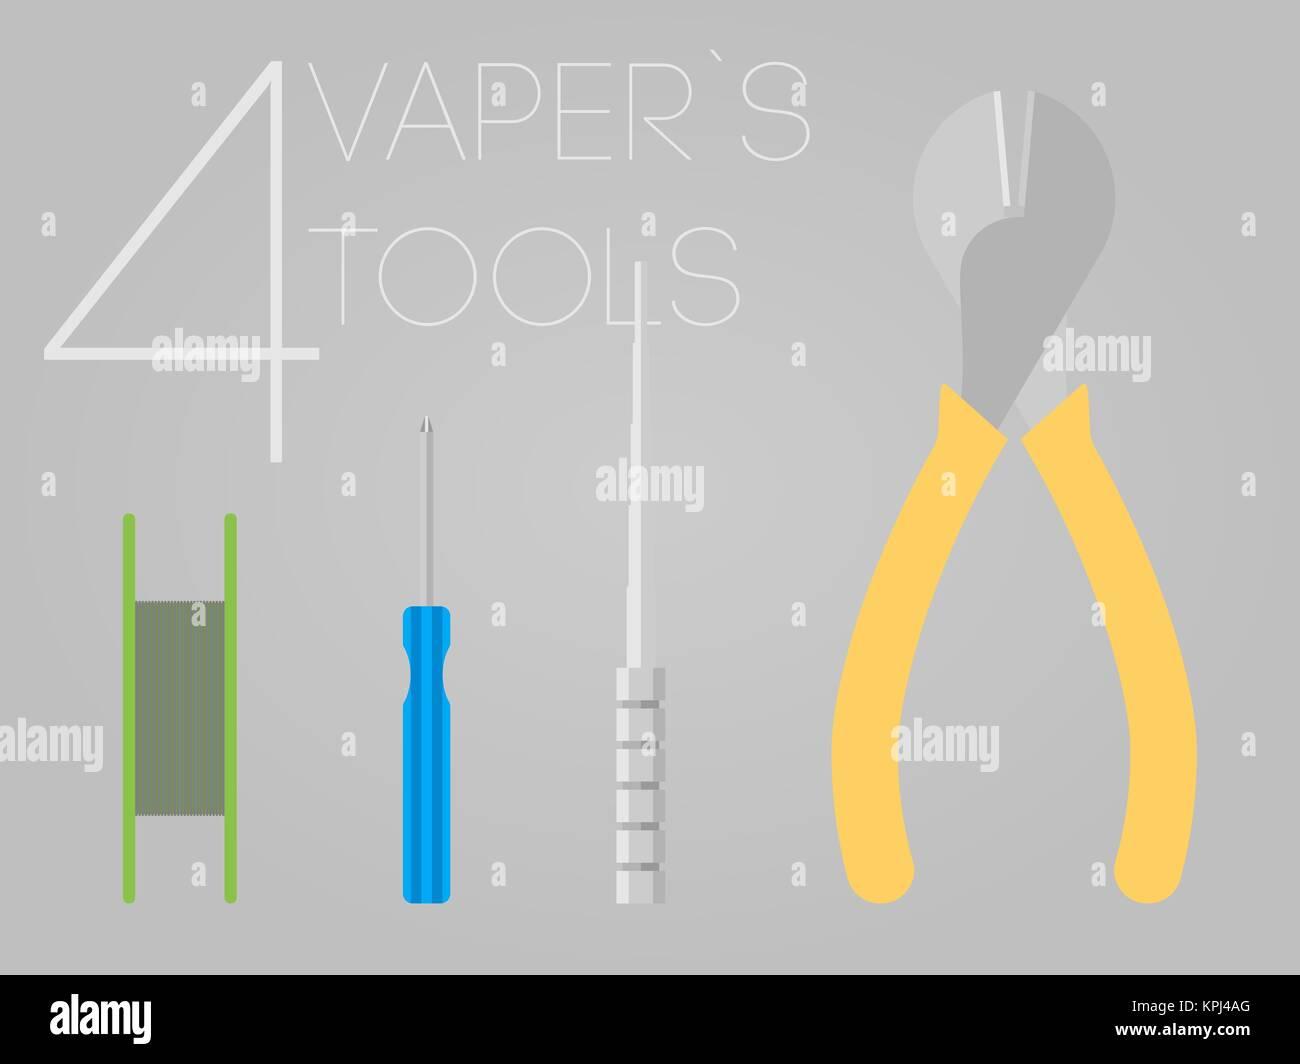 4 vaper tools set - Stock Image